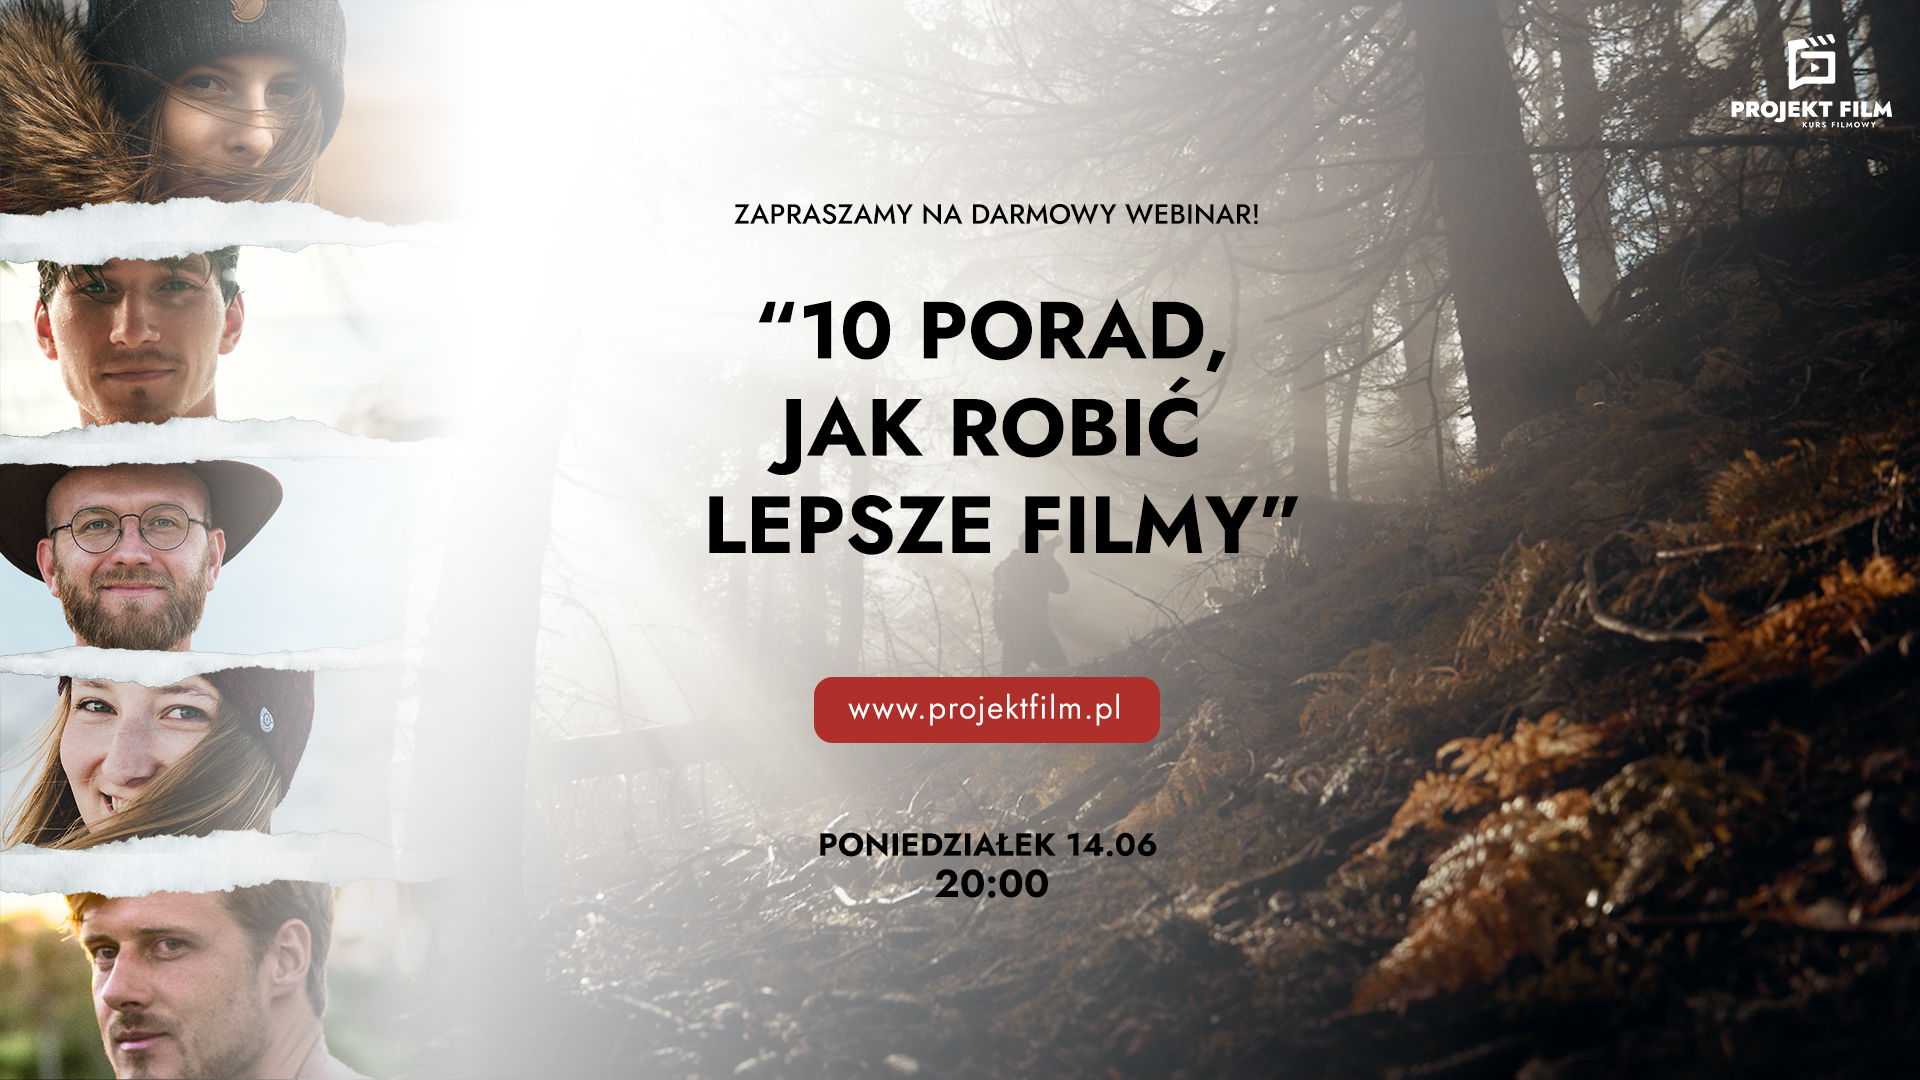 Darmowy Webinar Projekt Film